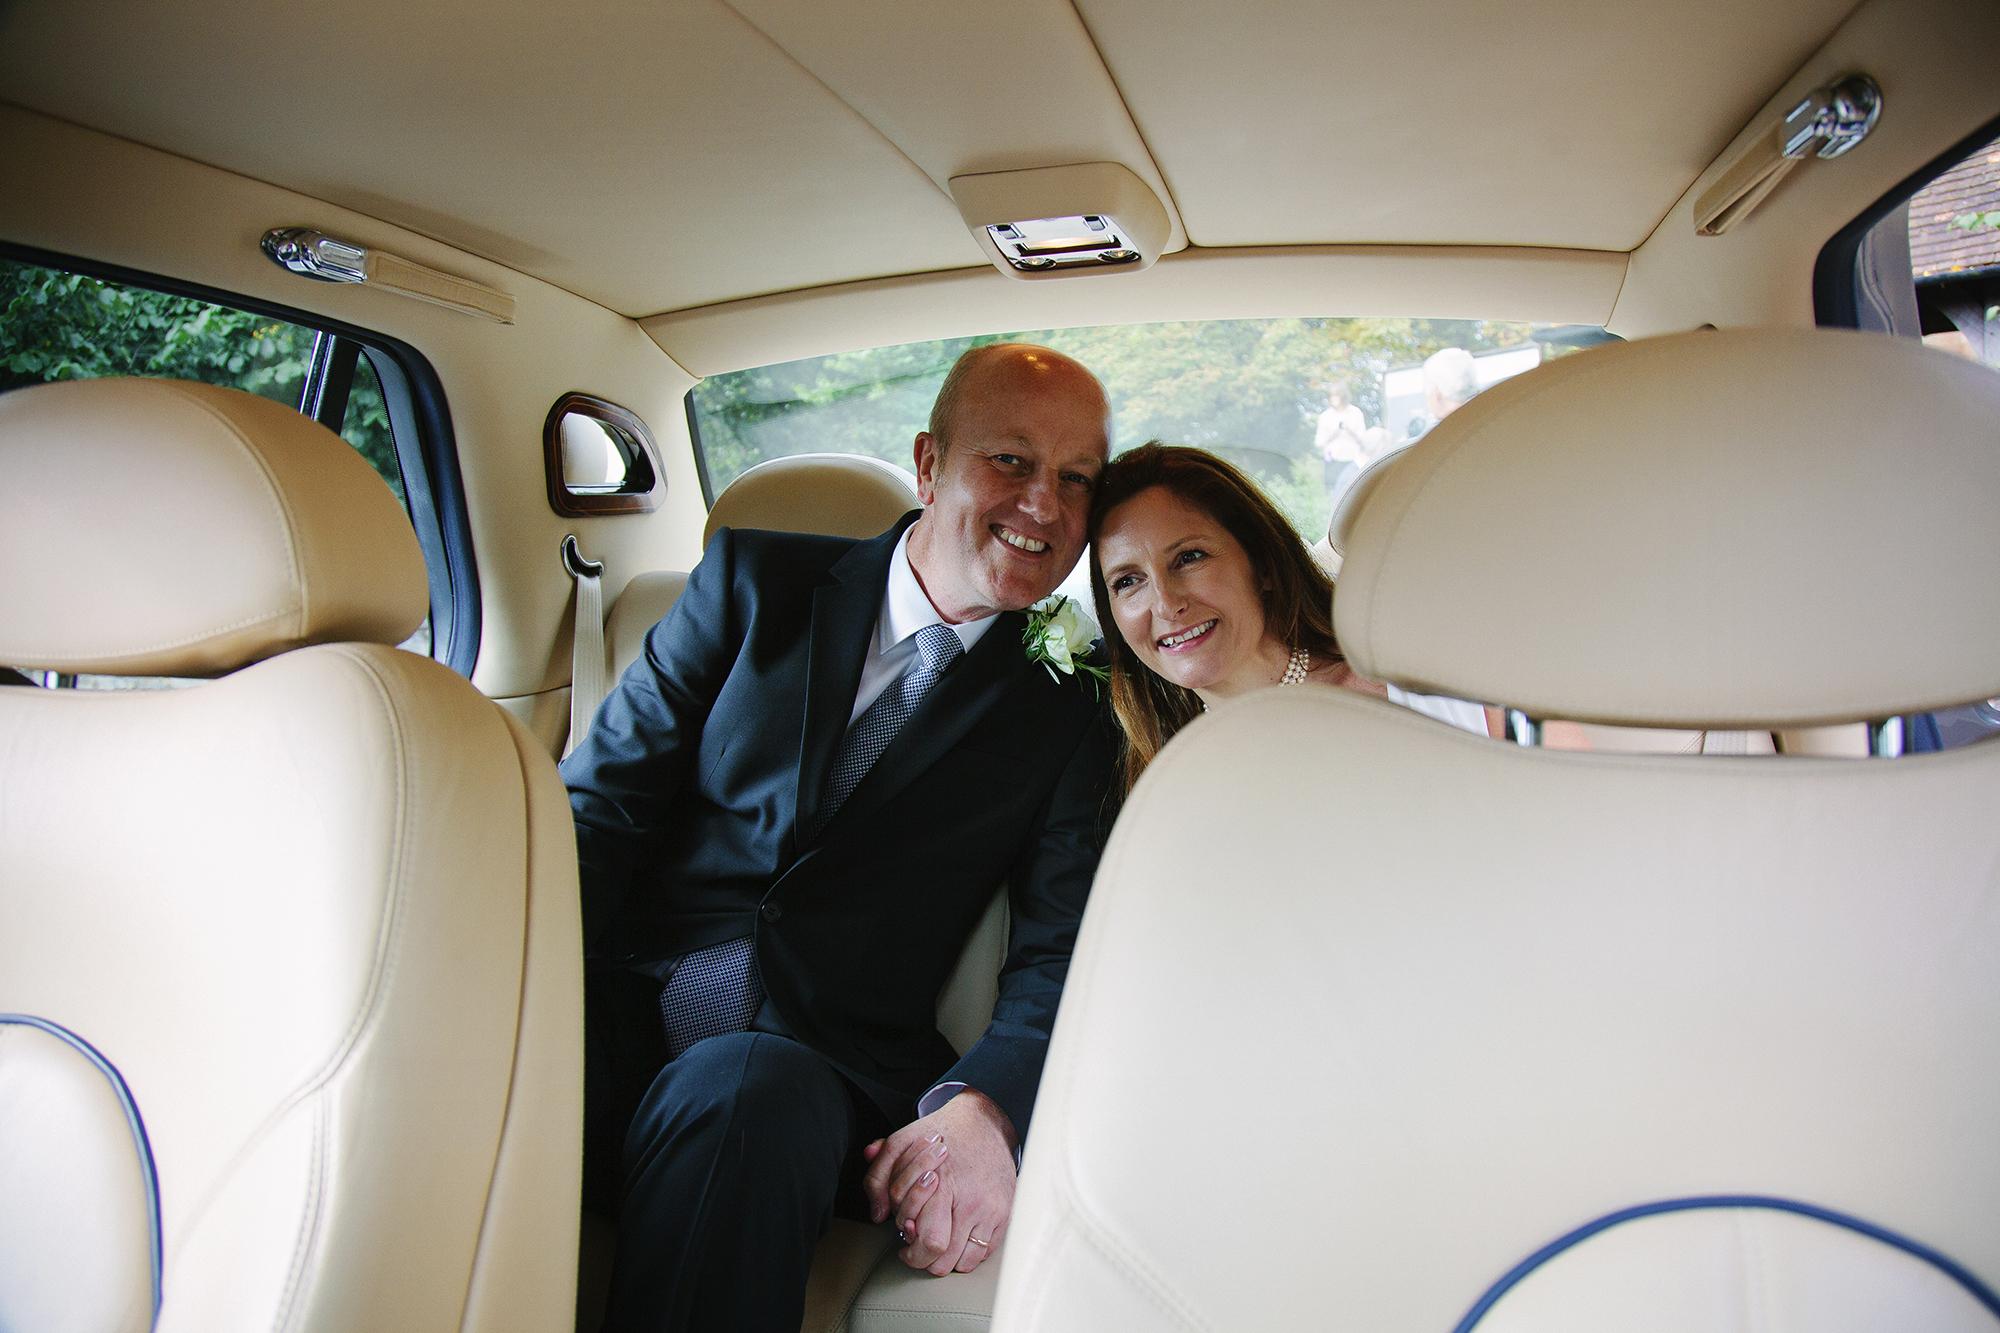 katie leask photography wedding la coco noire 0010